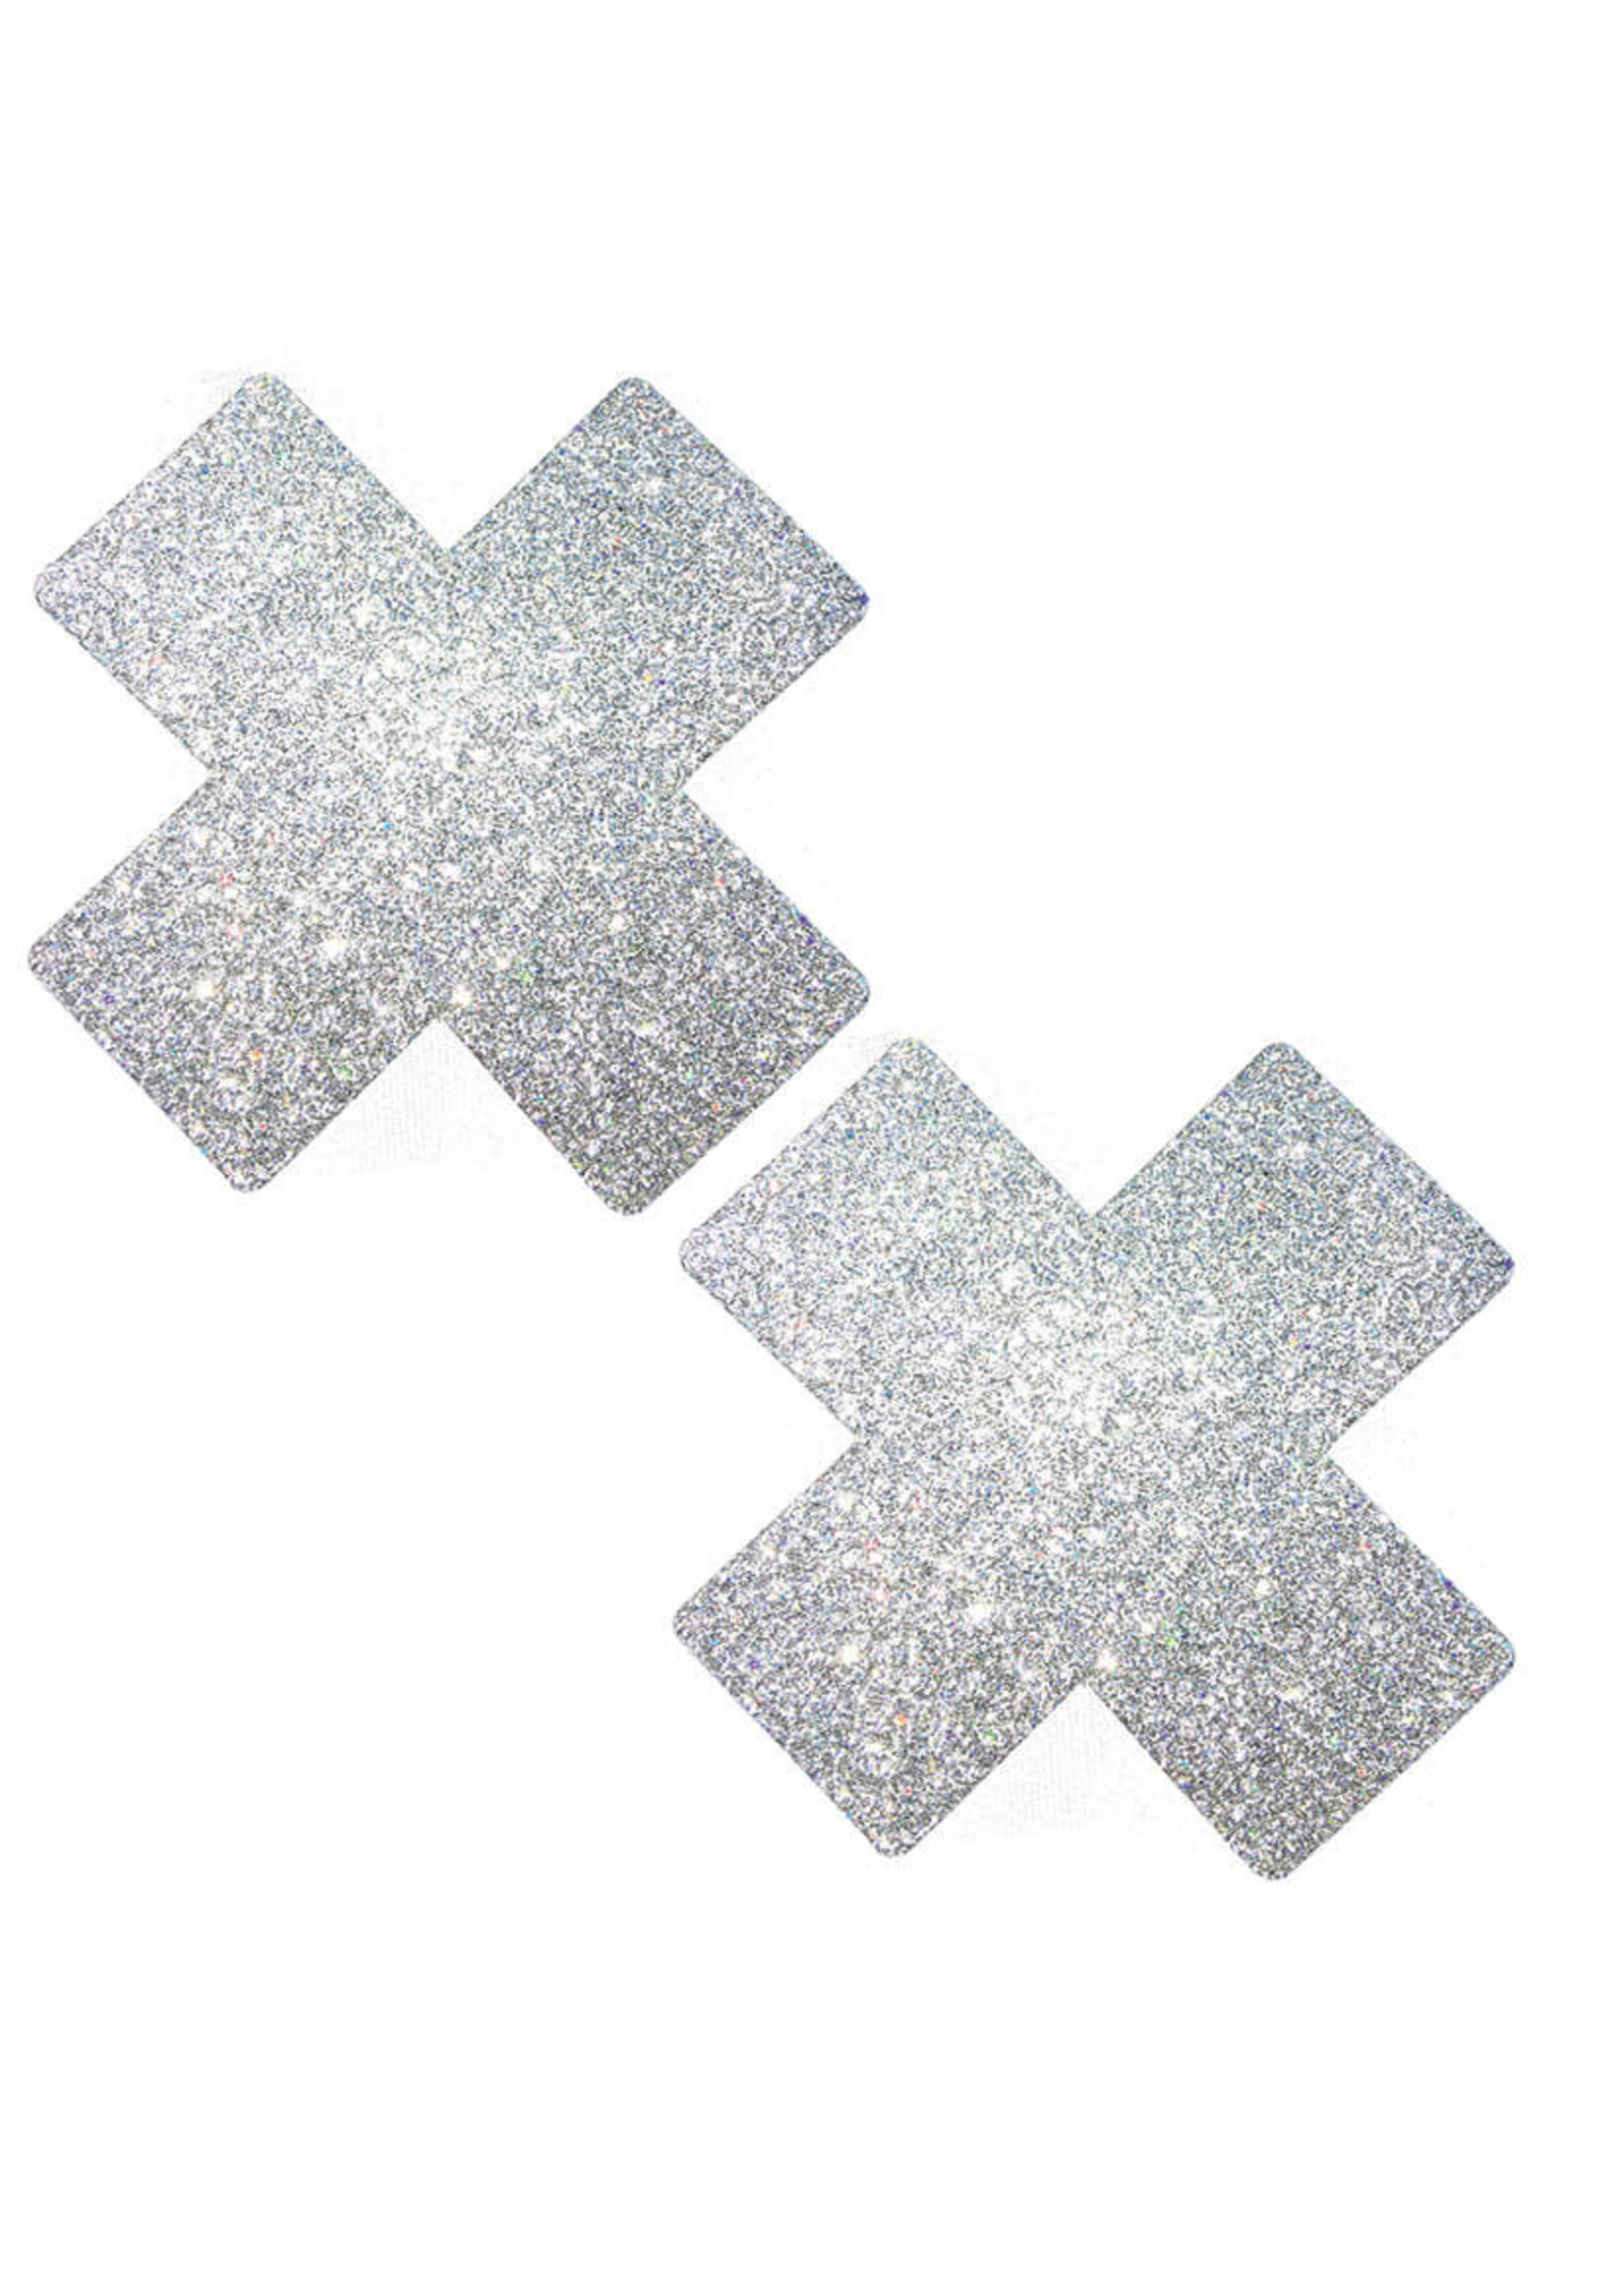 NEVA NUDE Nipztix X-Factor Silver Pixie Dust-Silver Glitter